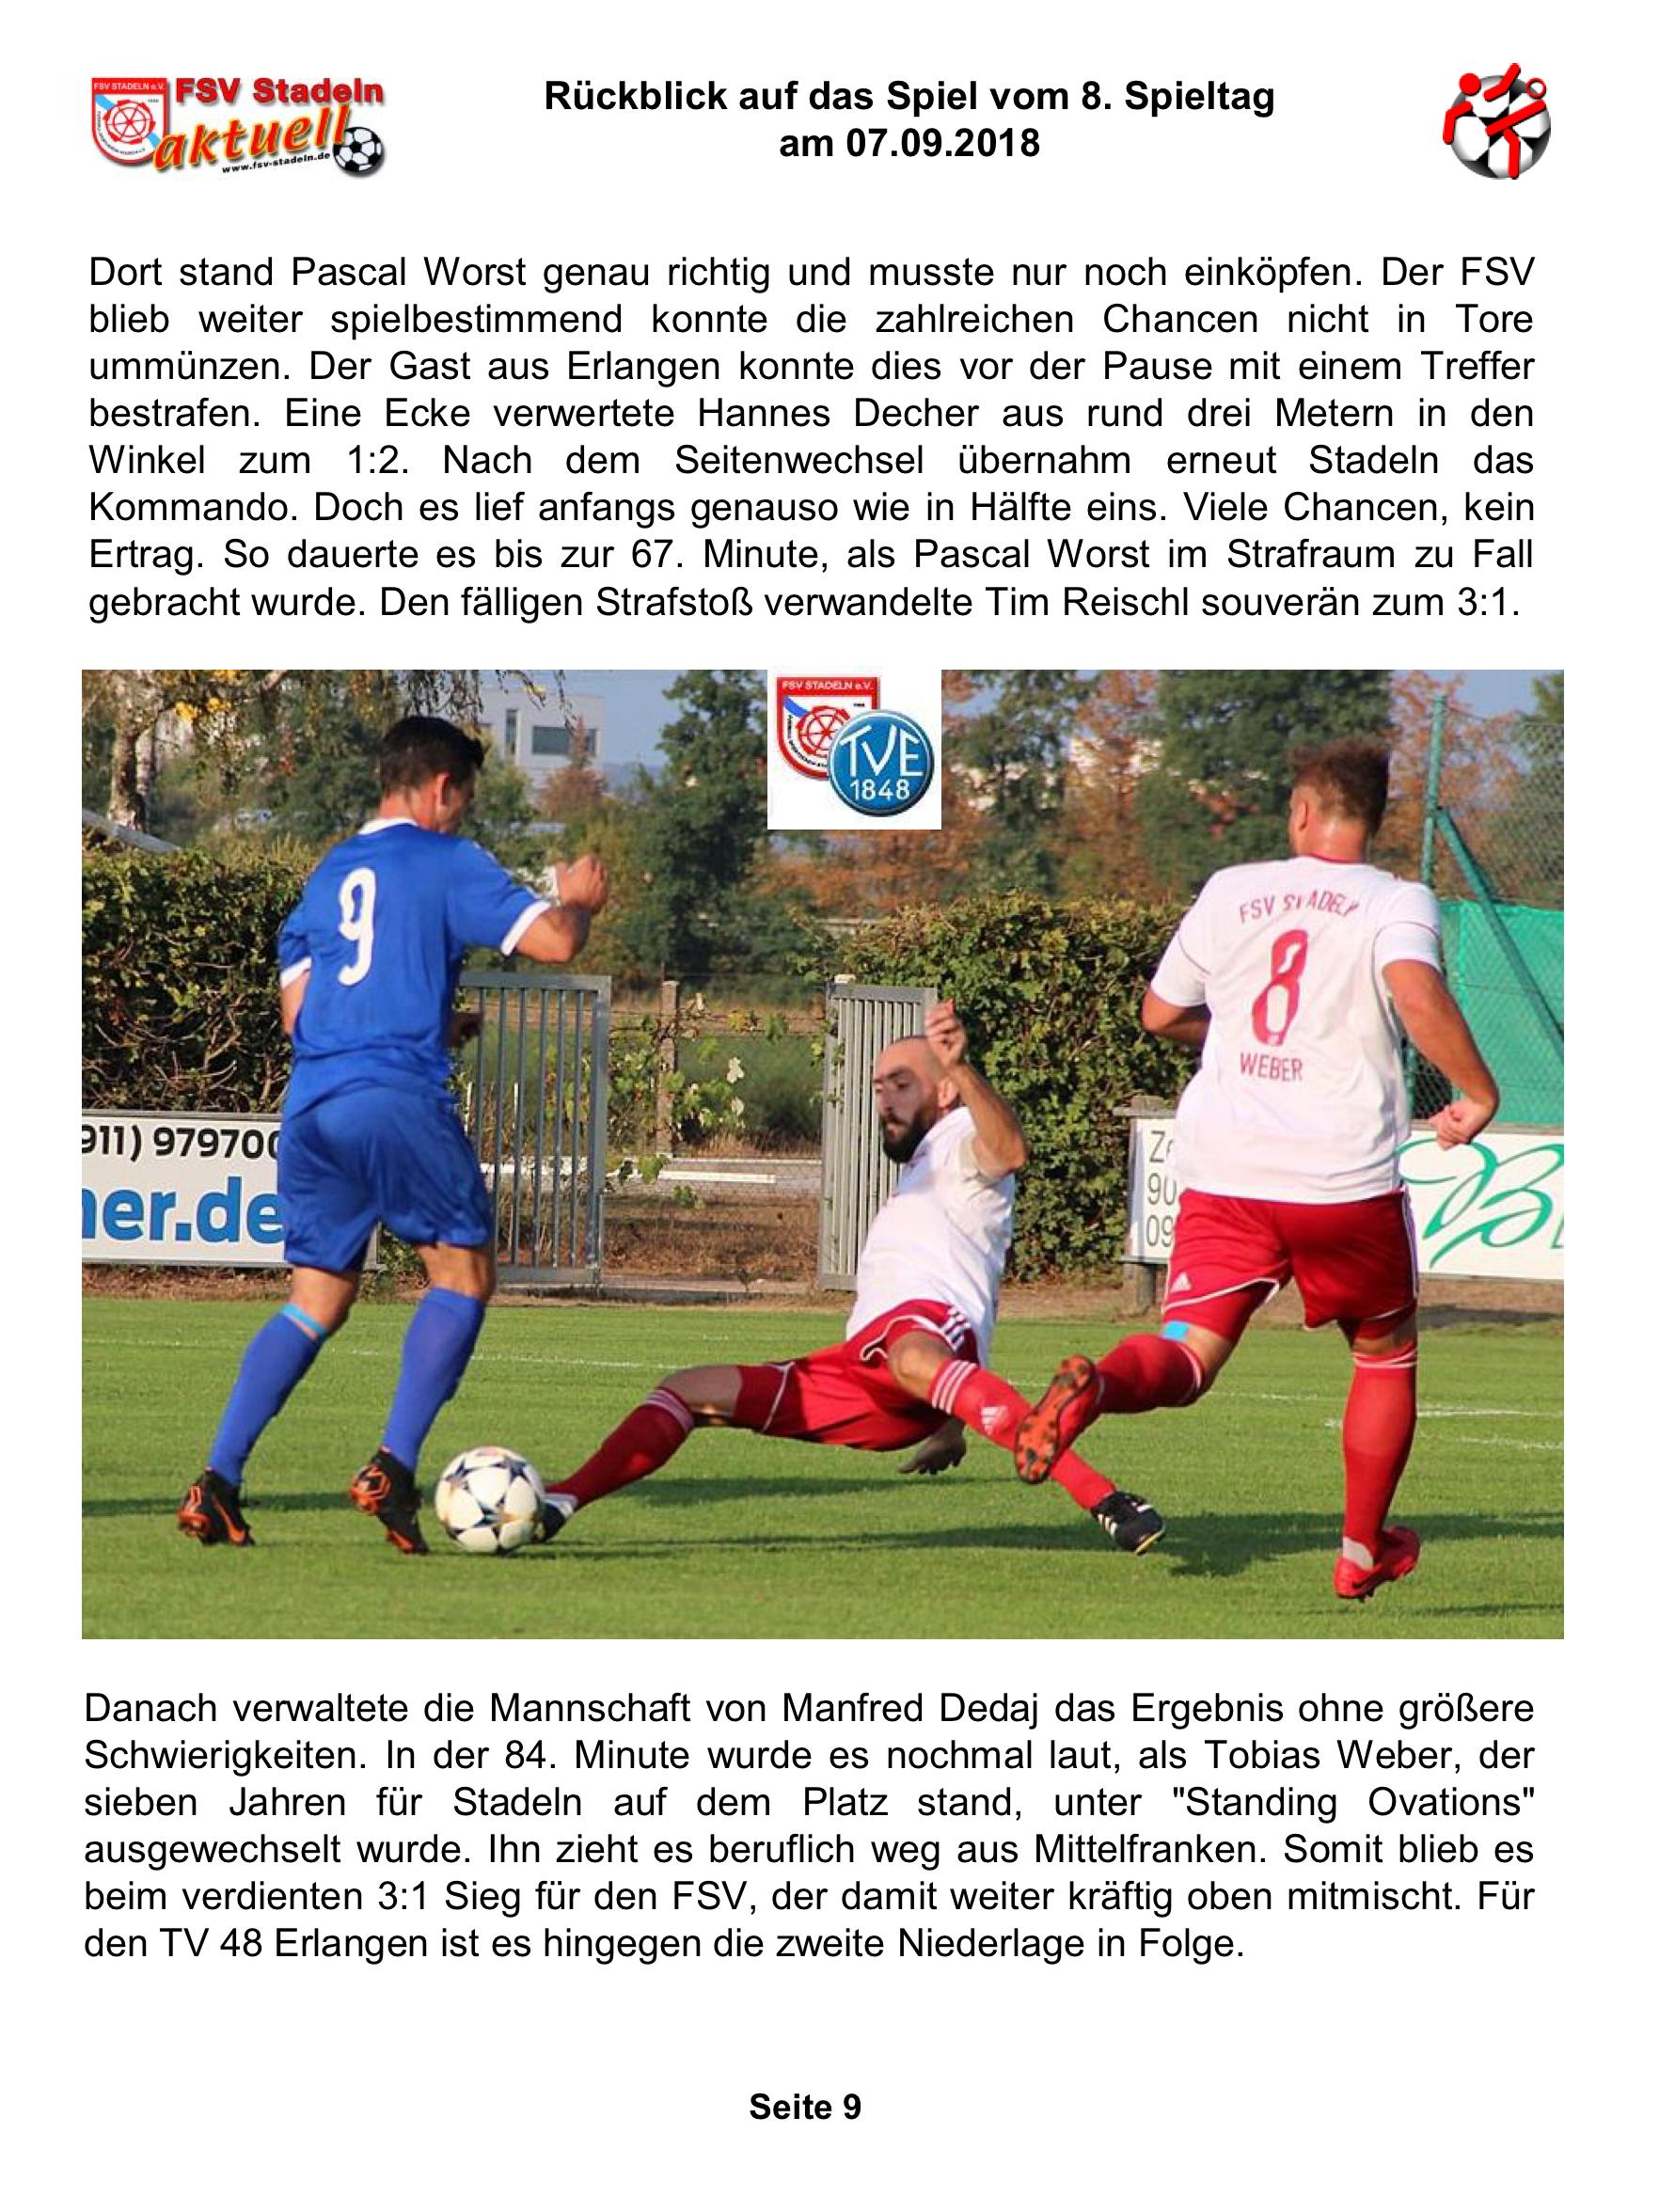 Diepersdorf-9.png